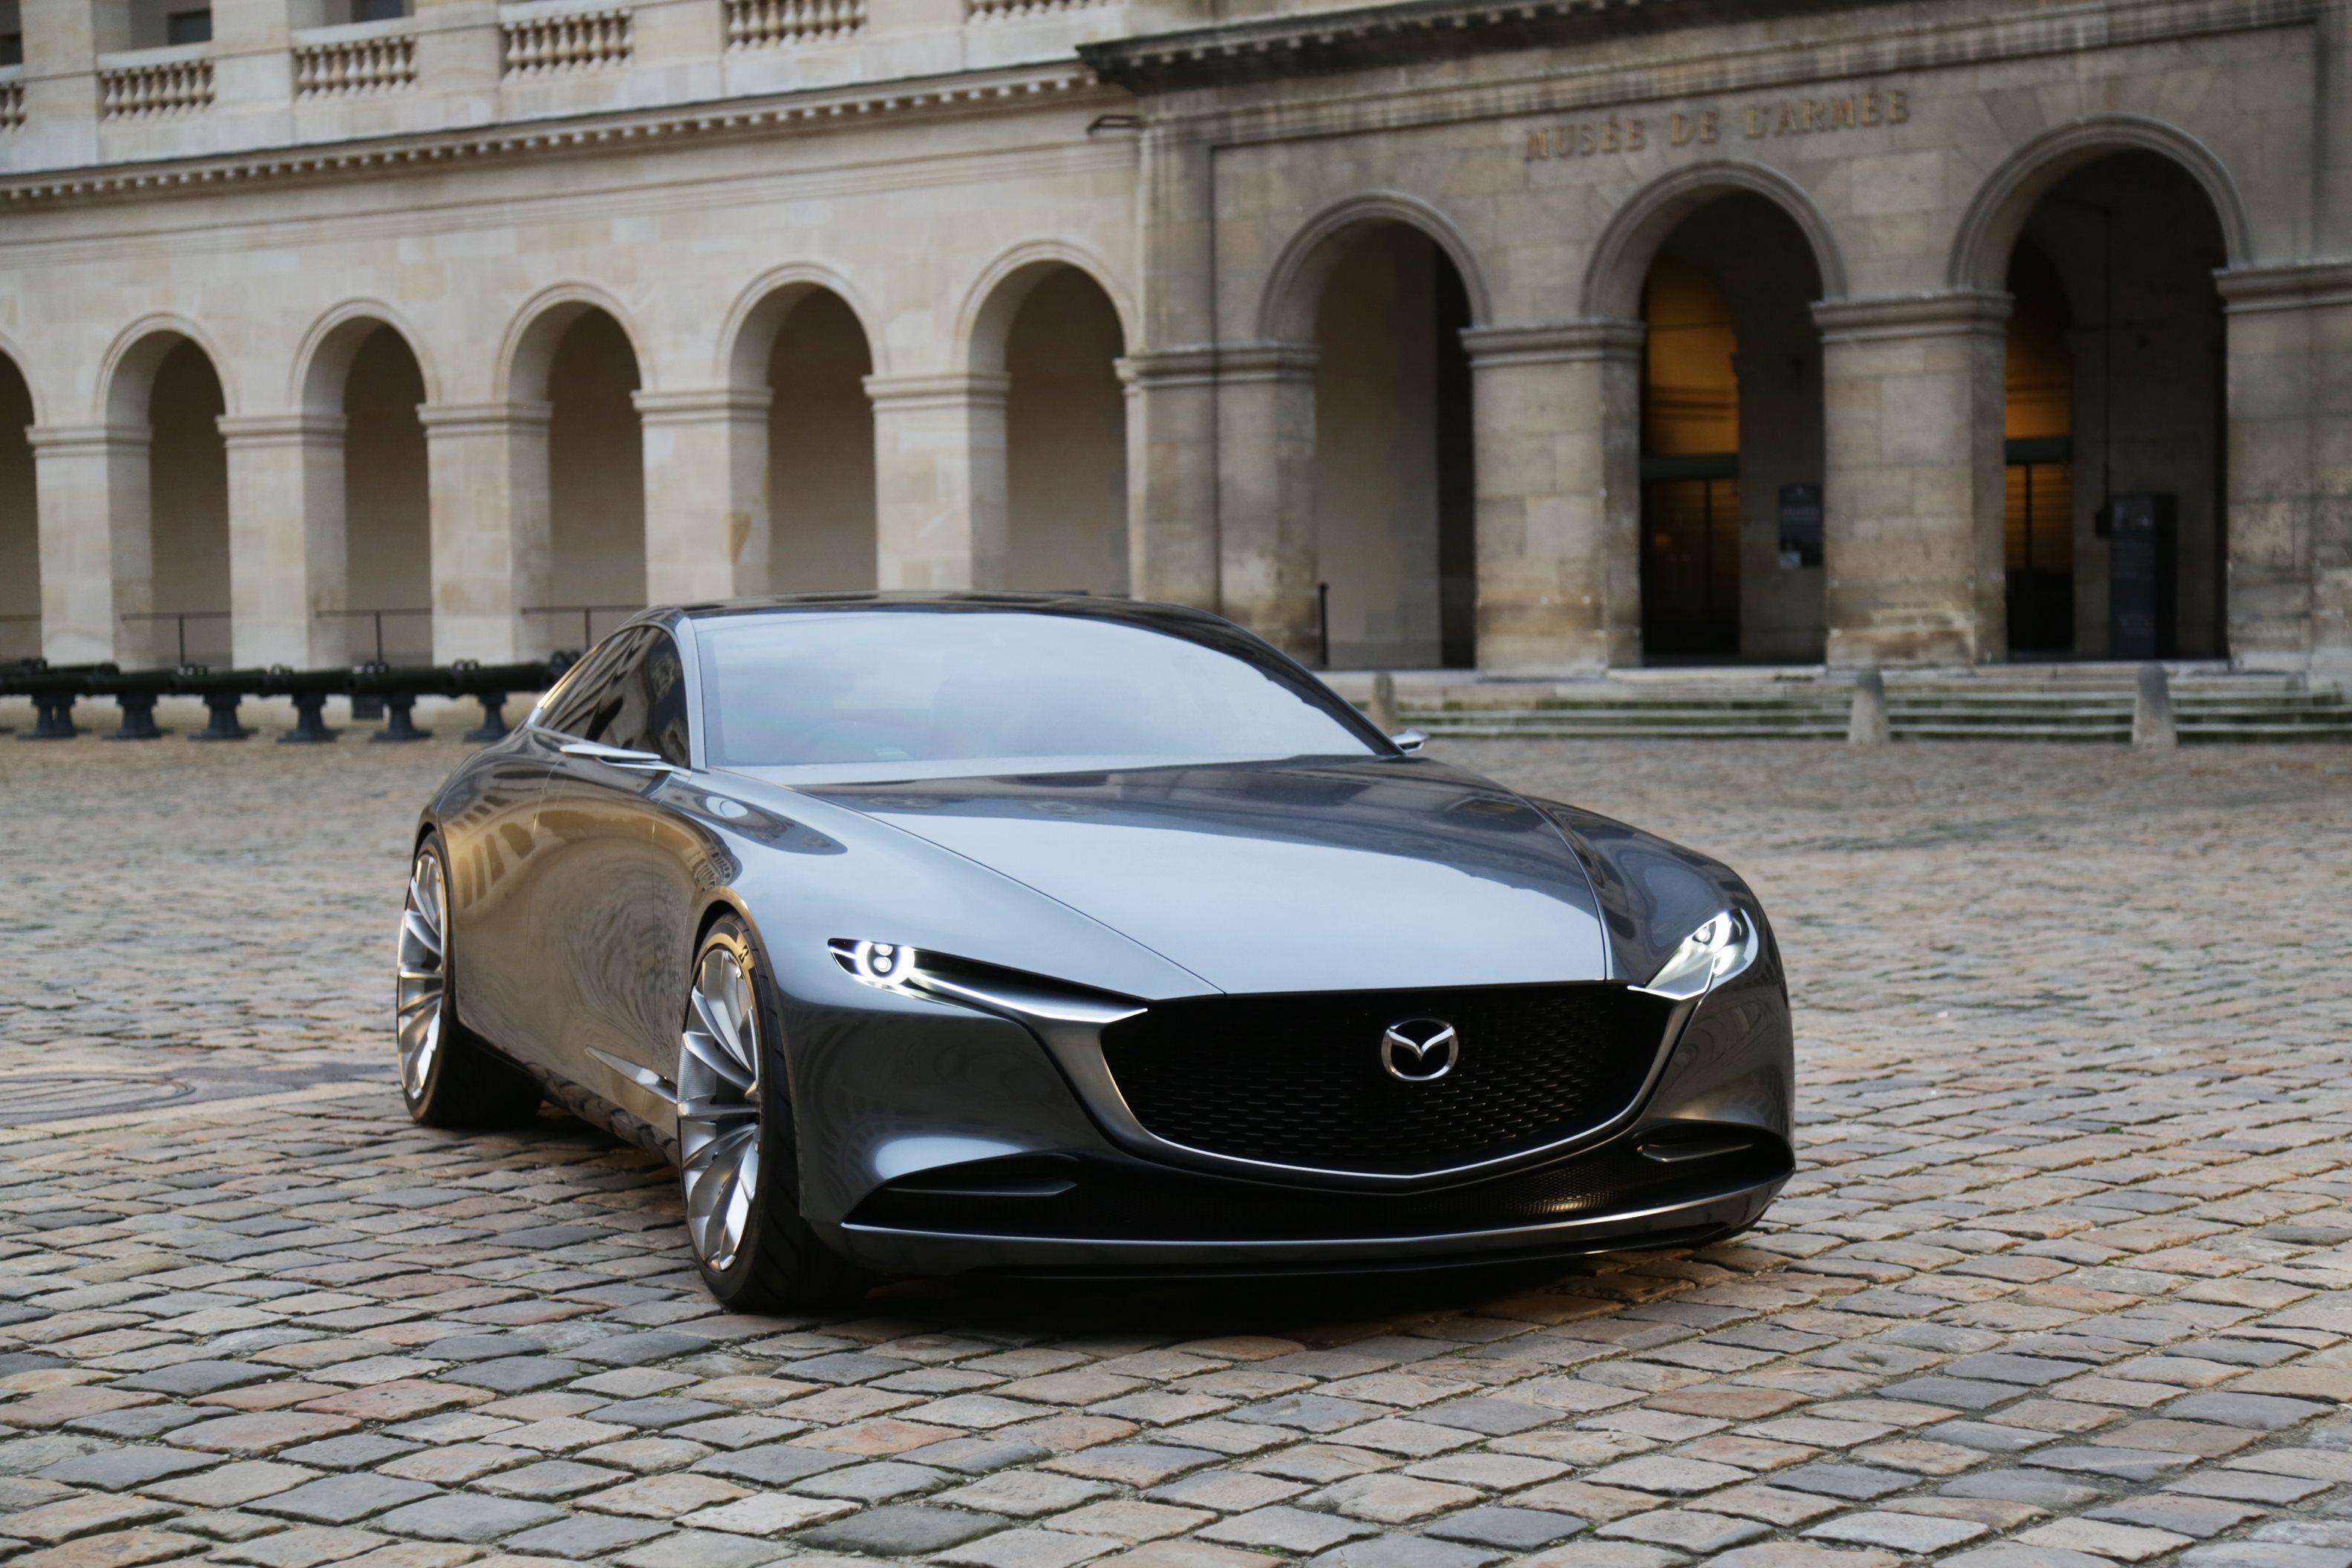 Mazda VISION COUPE osvojio nagradu za najlepši koncept